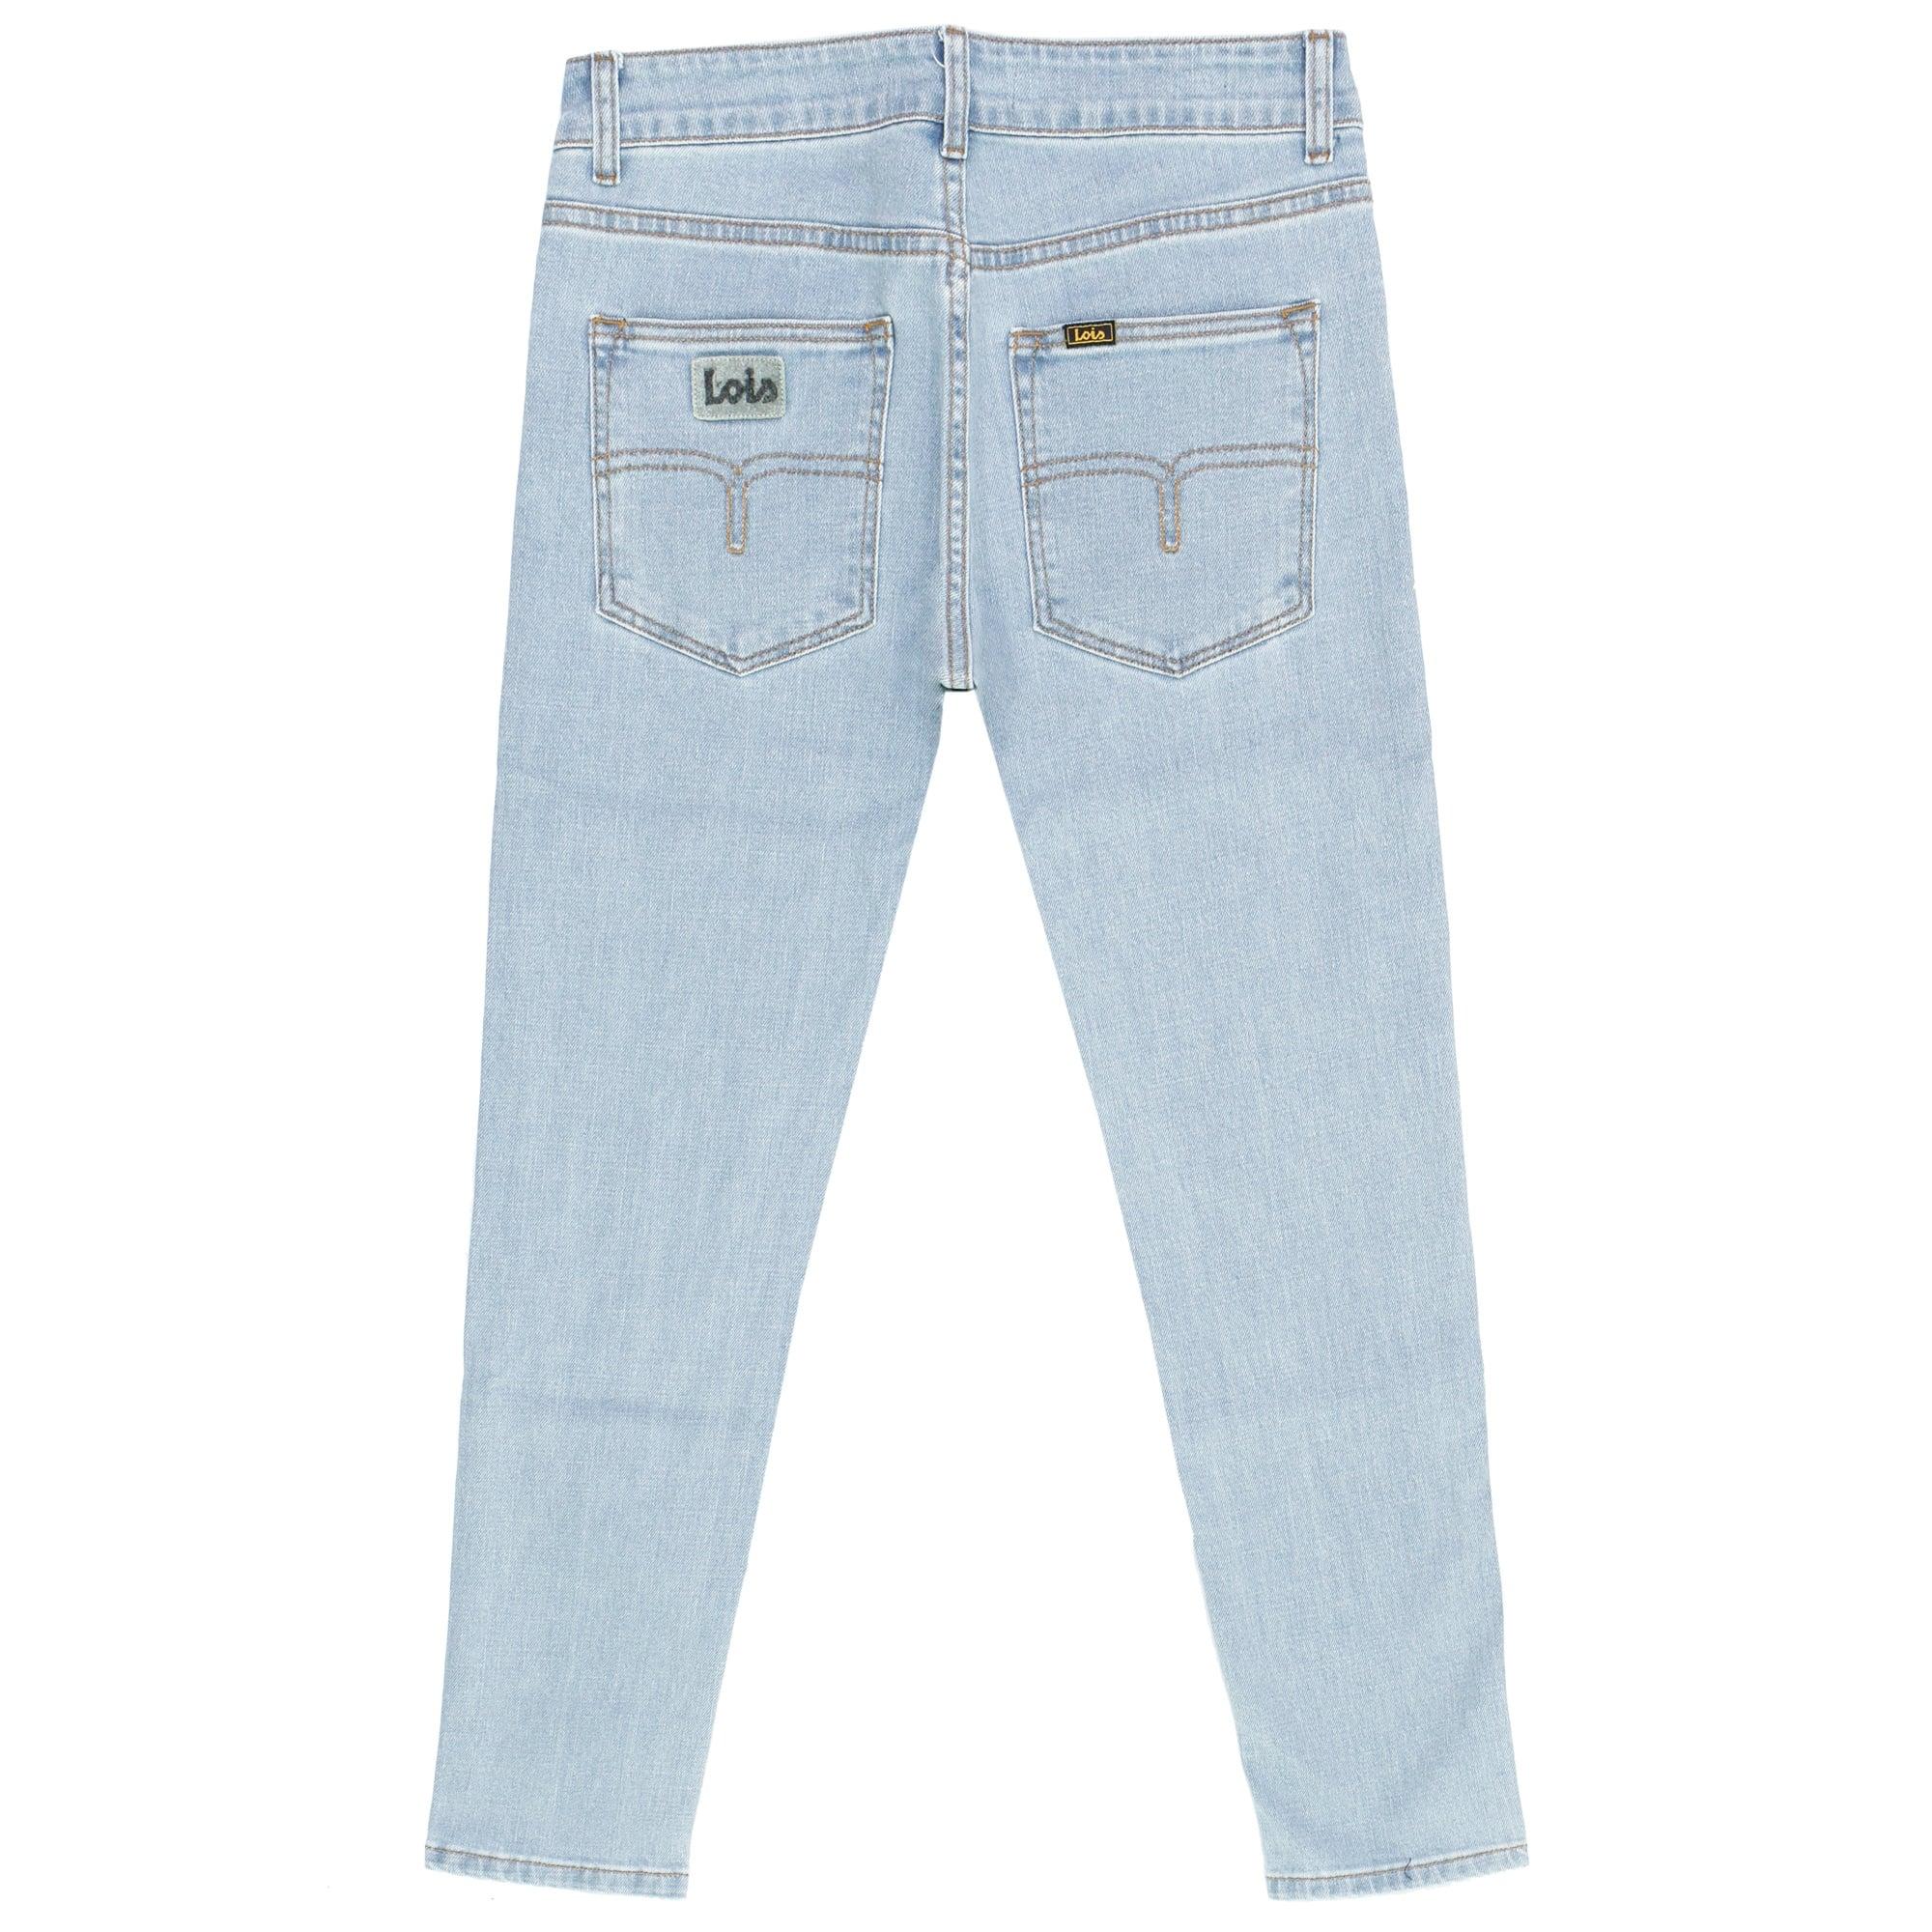 Flecha bolita Multa  Lois Jeans | Sky Bleach Denim Jeans at Stuarts London